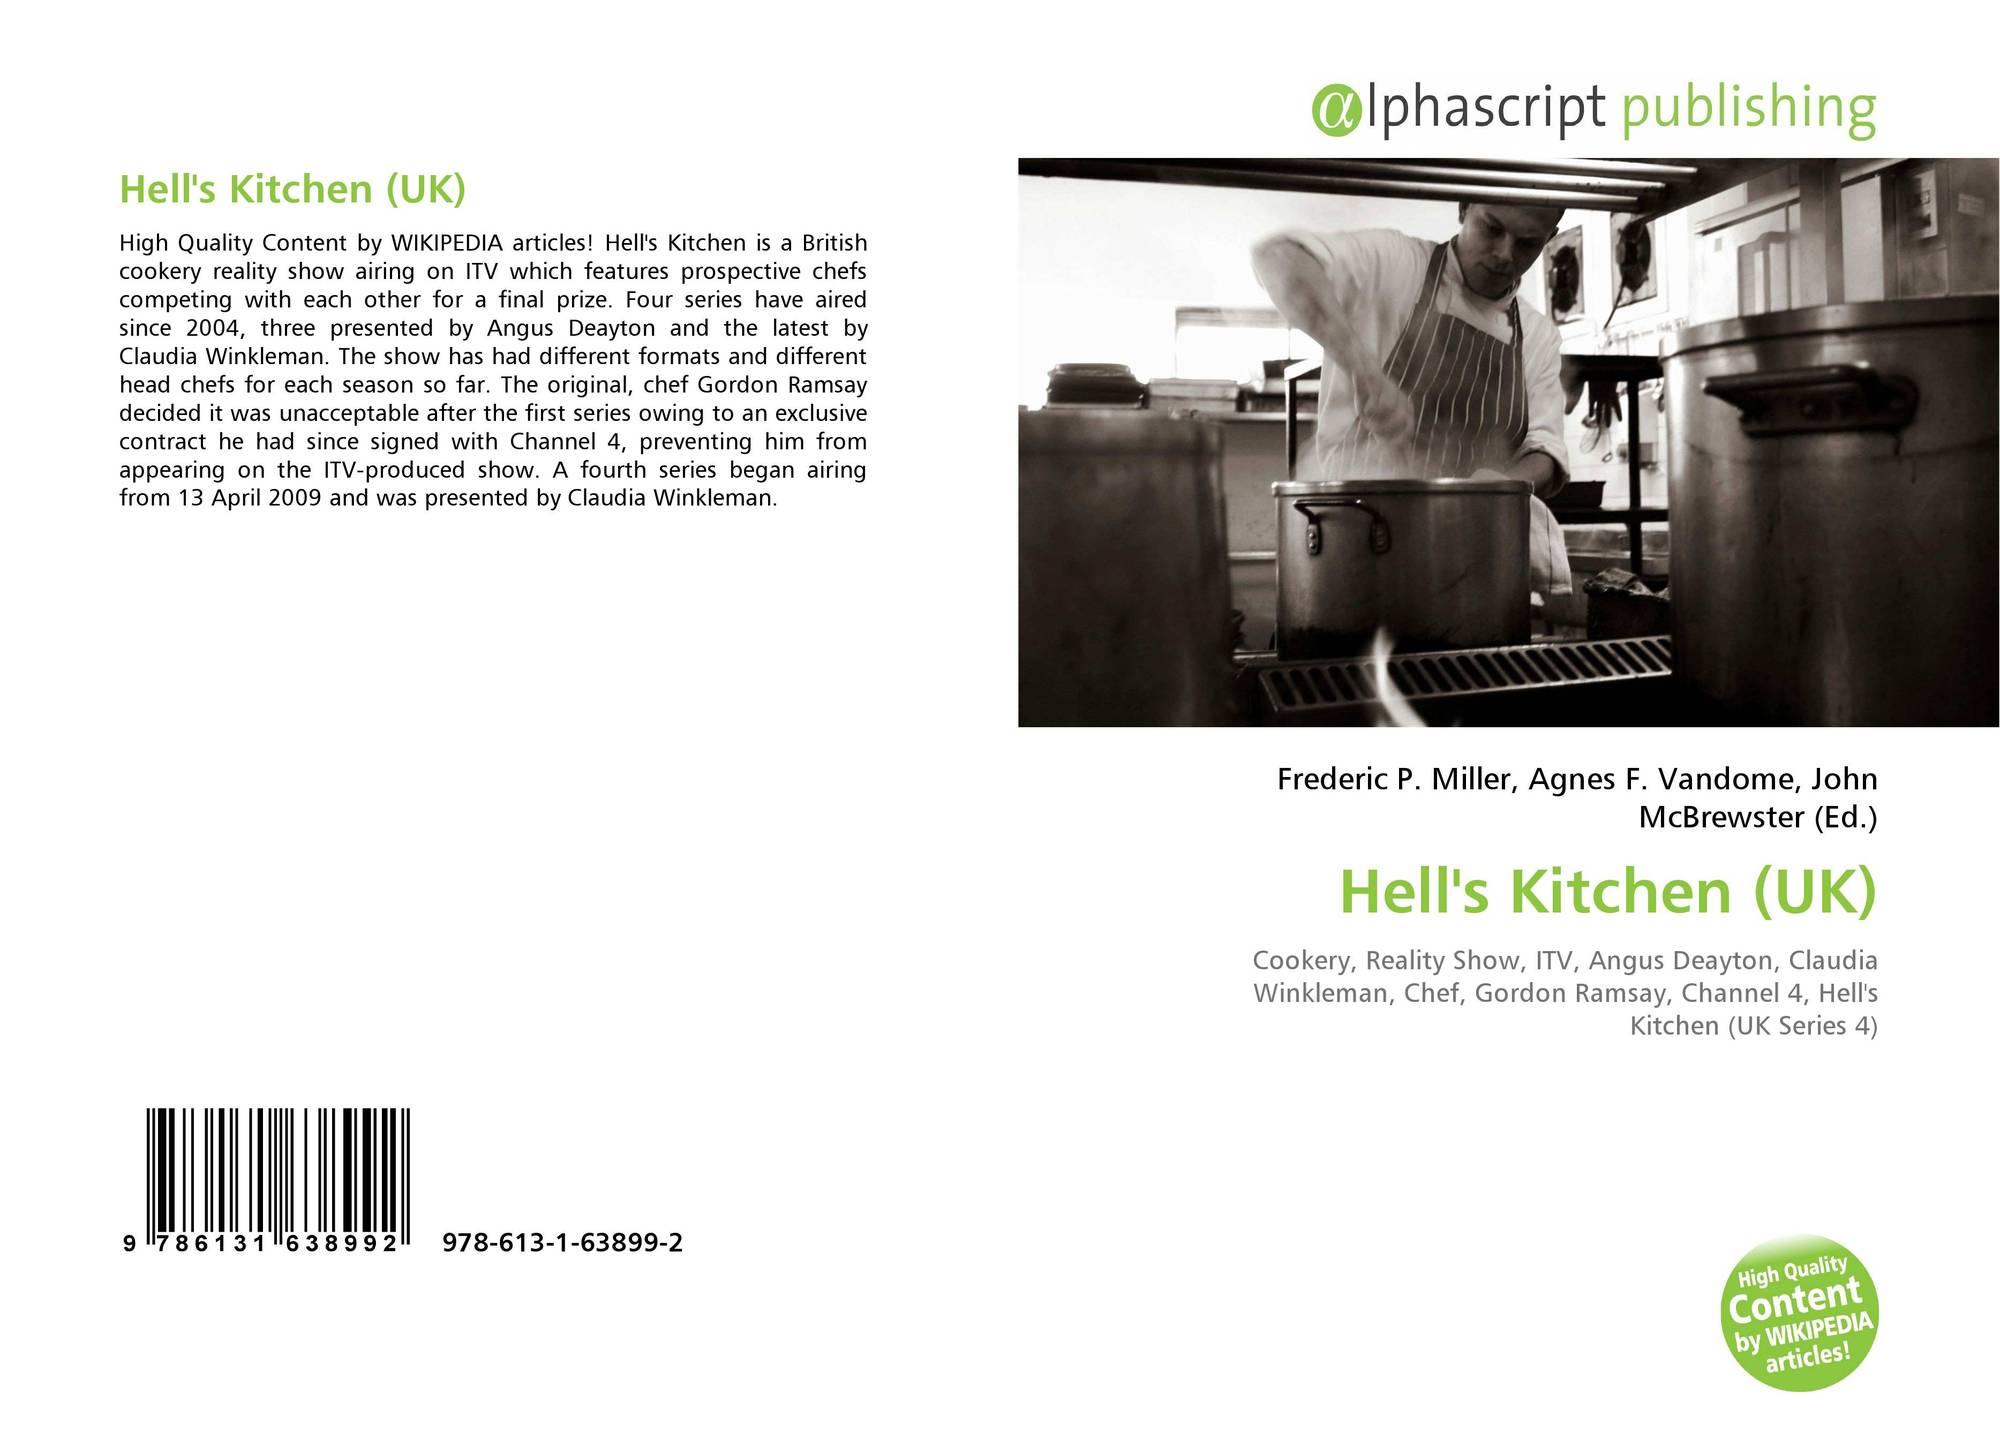 Hell S Kitchen Uk 978 613 1 63899 2 6131638993 9786131638992